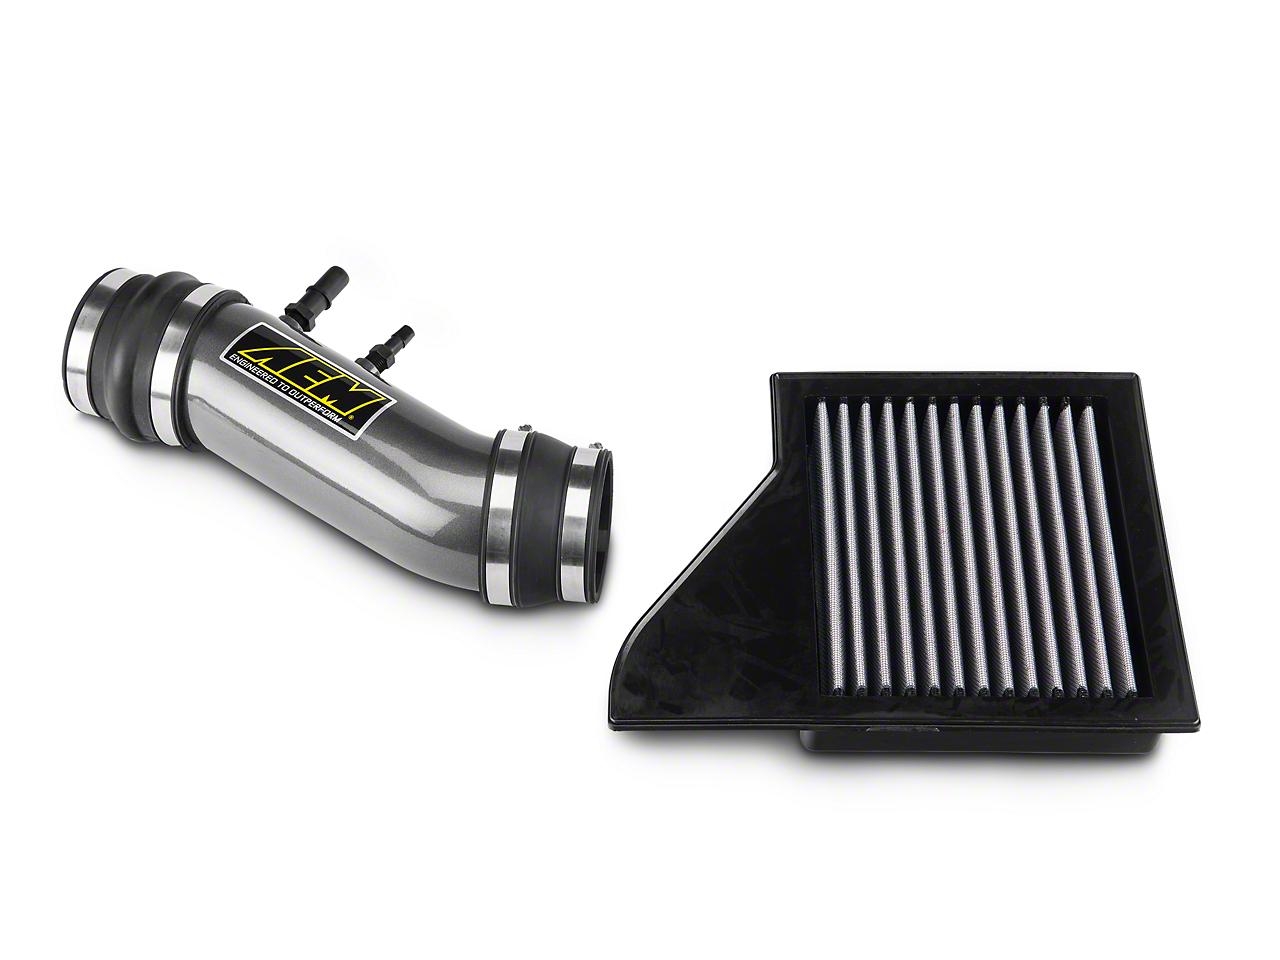 AEM Intake Tube w/ DryFlow Replacement Filter (11-14 V6)